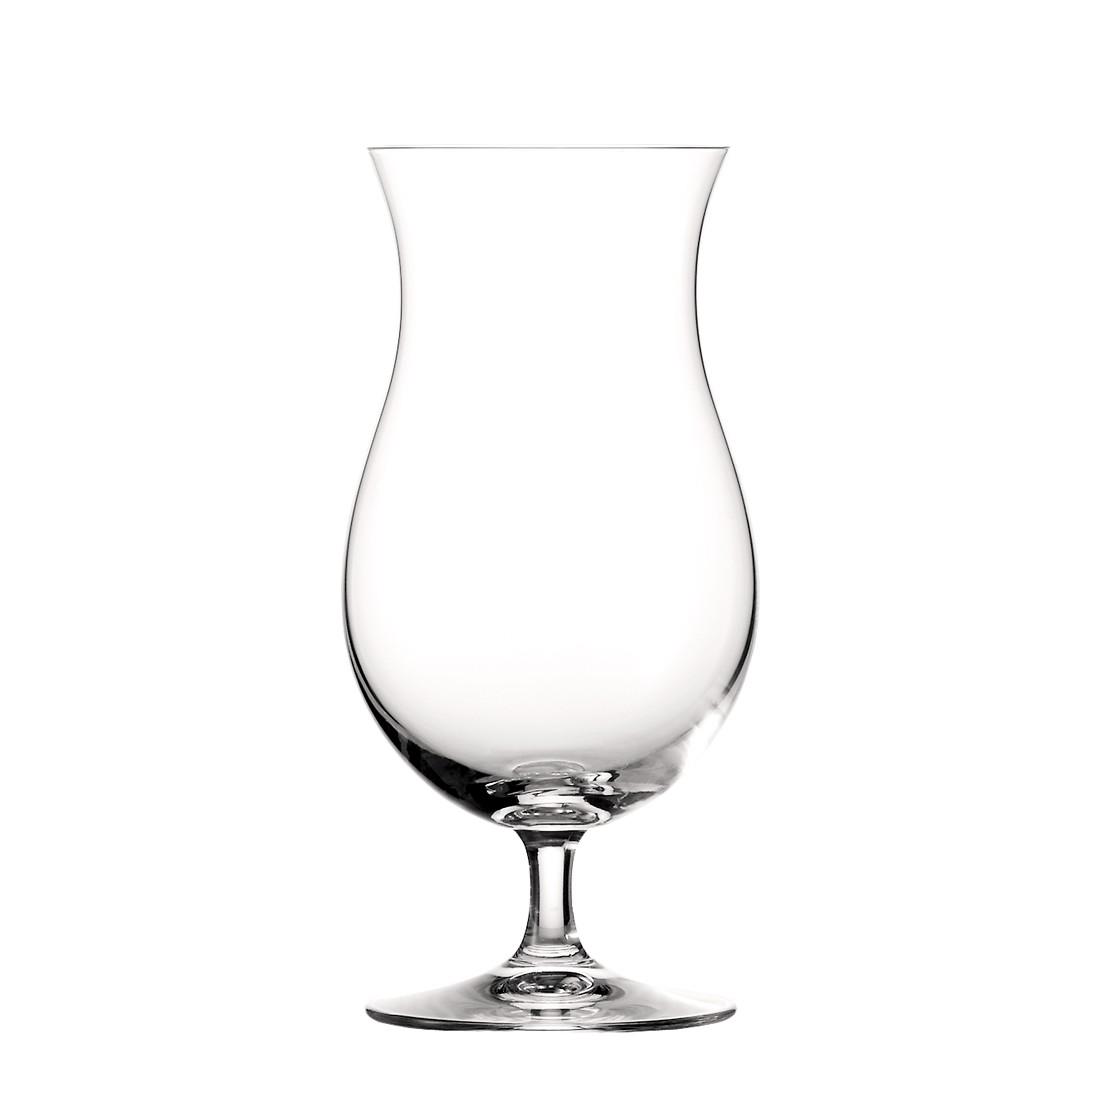 SpecialGlass Tropical Cocktailglas 6er-Set, Spiegelau bestellen